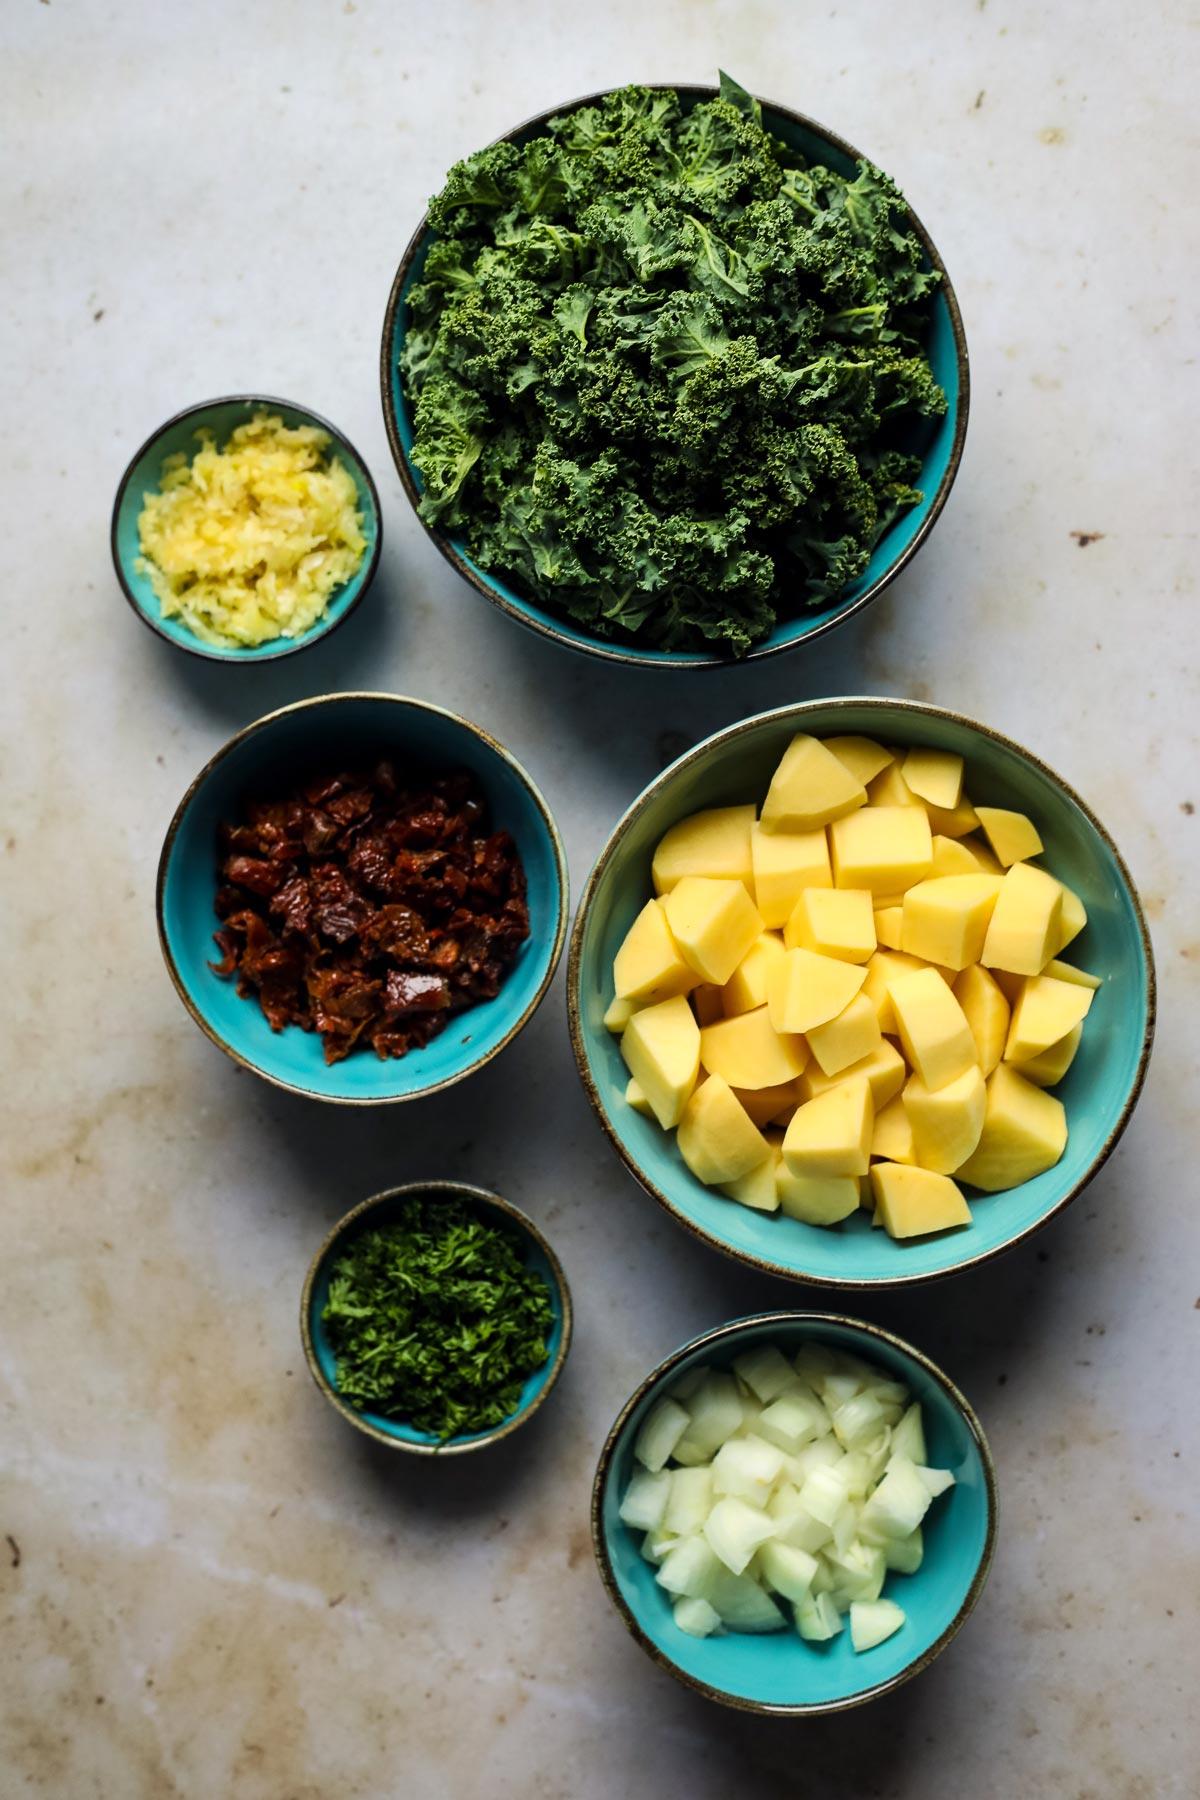 Prepped vegetables for kale potato soup in bowls.